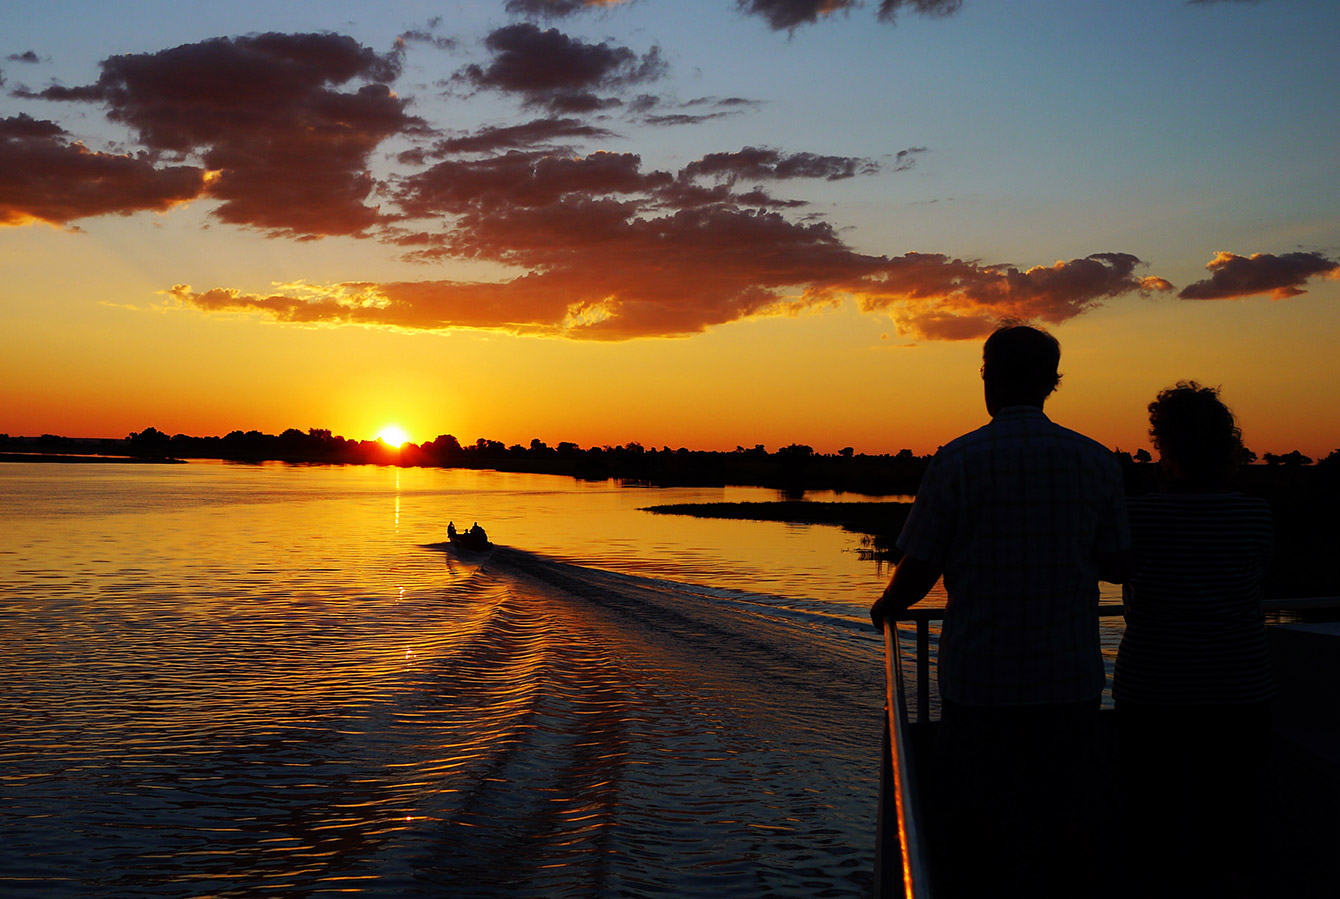 Silhouettes at Sunset Aboard the Zambezi Queen, Chobe River, Botswana, Africa